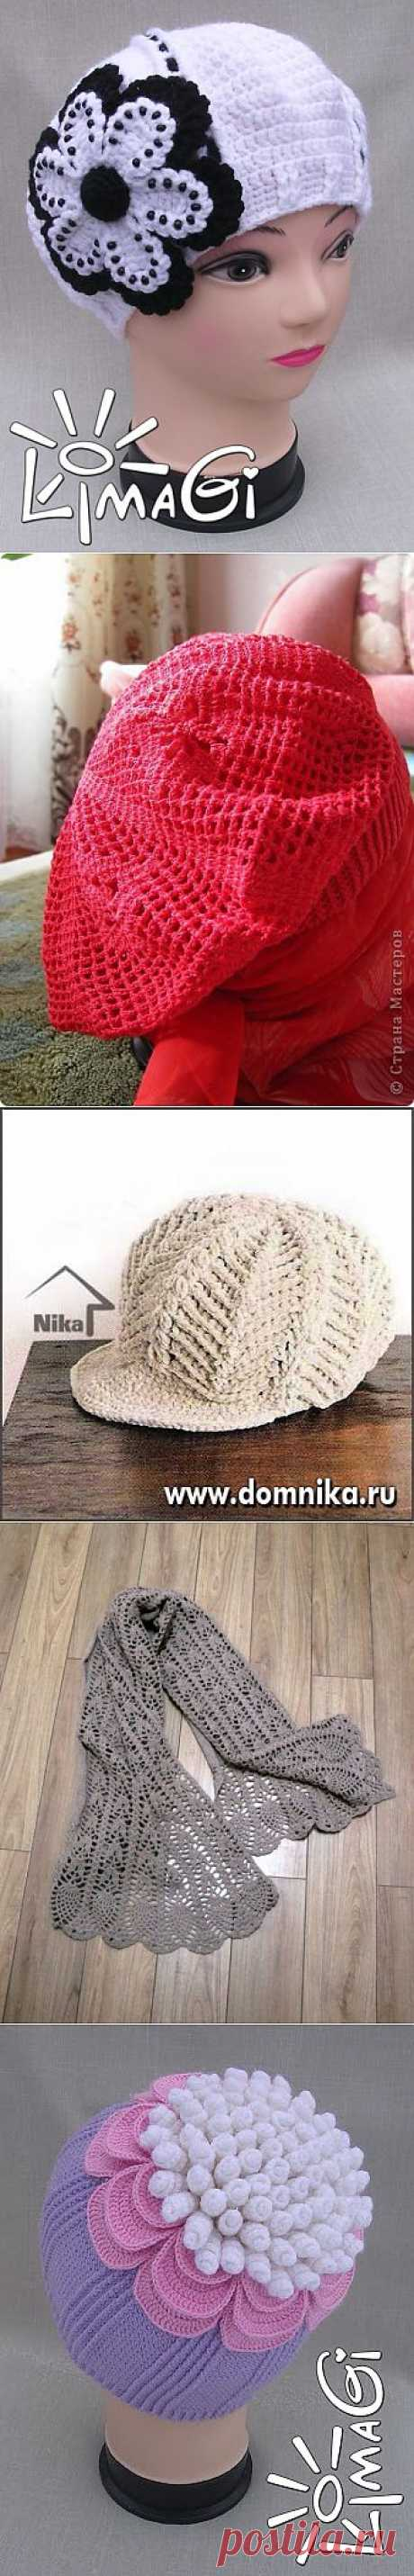 Шали, шарфы, шапочки крючком. Подборка 26.